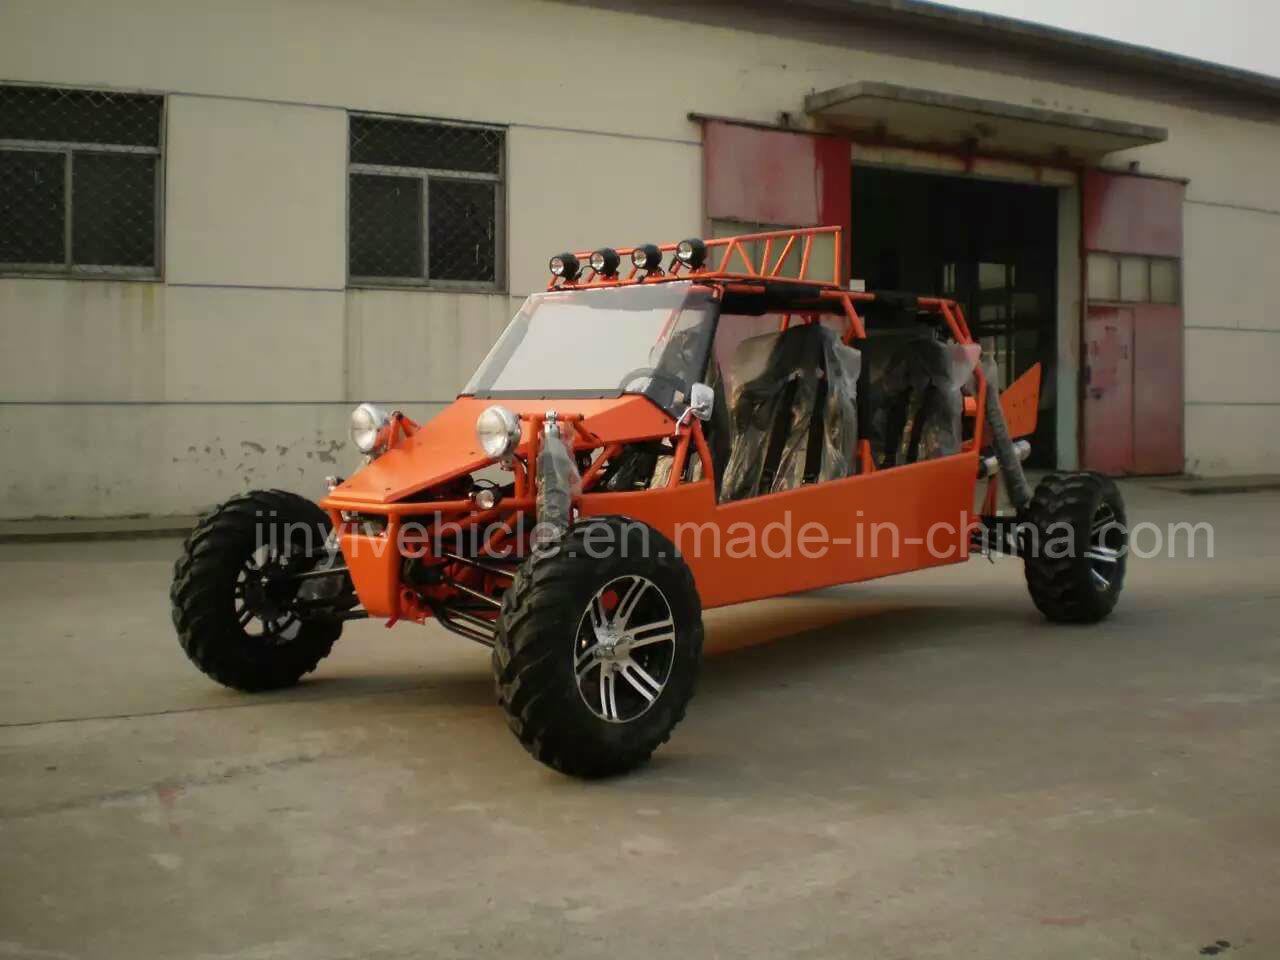 970cc Powerful ATV Quad off Road with EPA Certificate